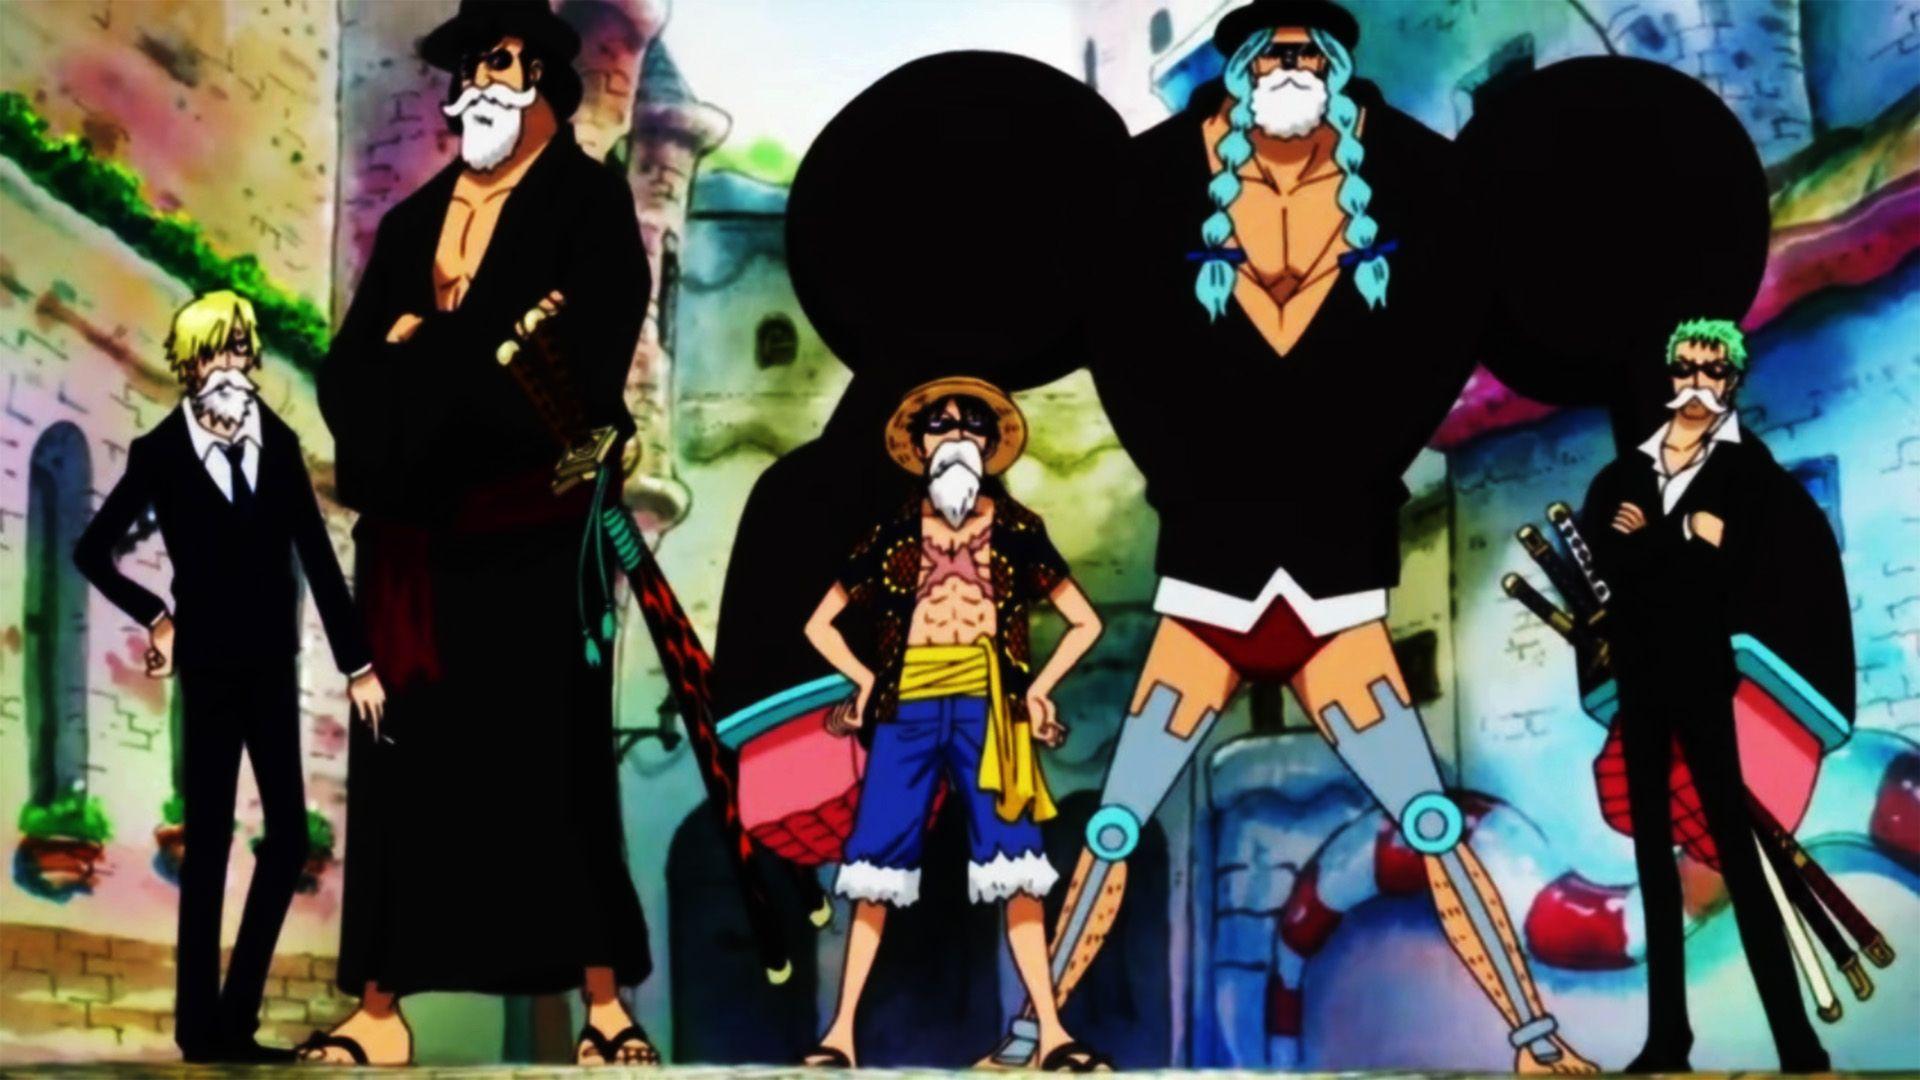 Funny image by keyforce anime cartoon one piece